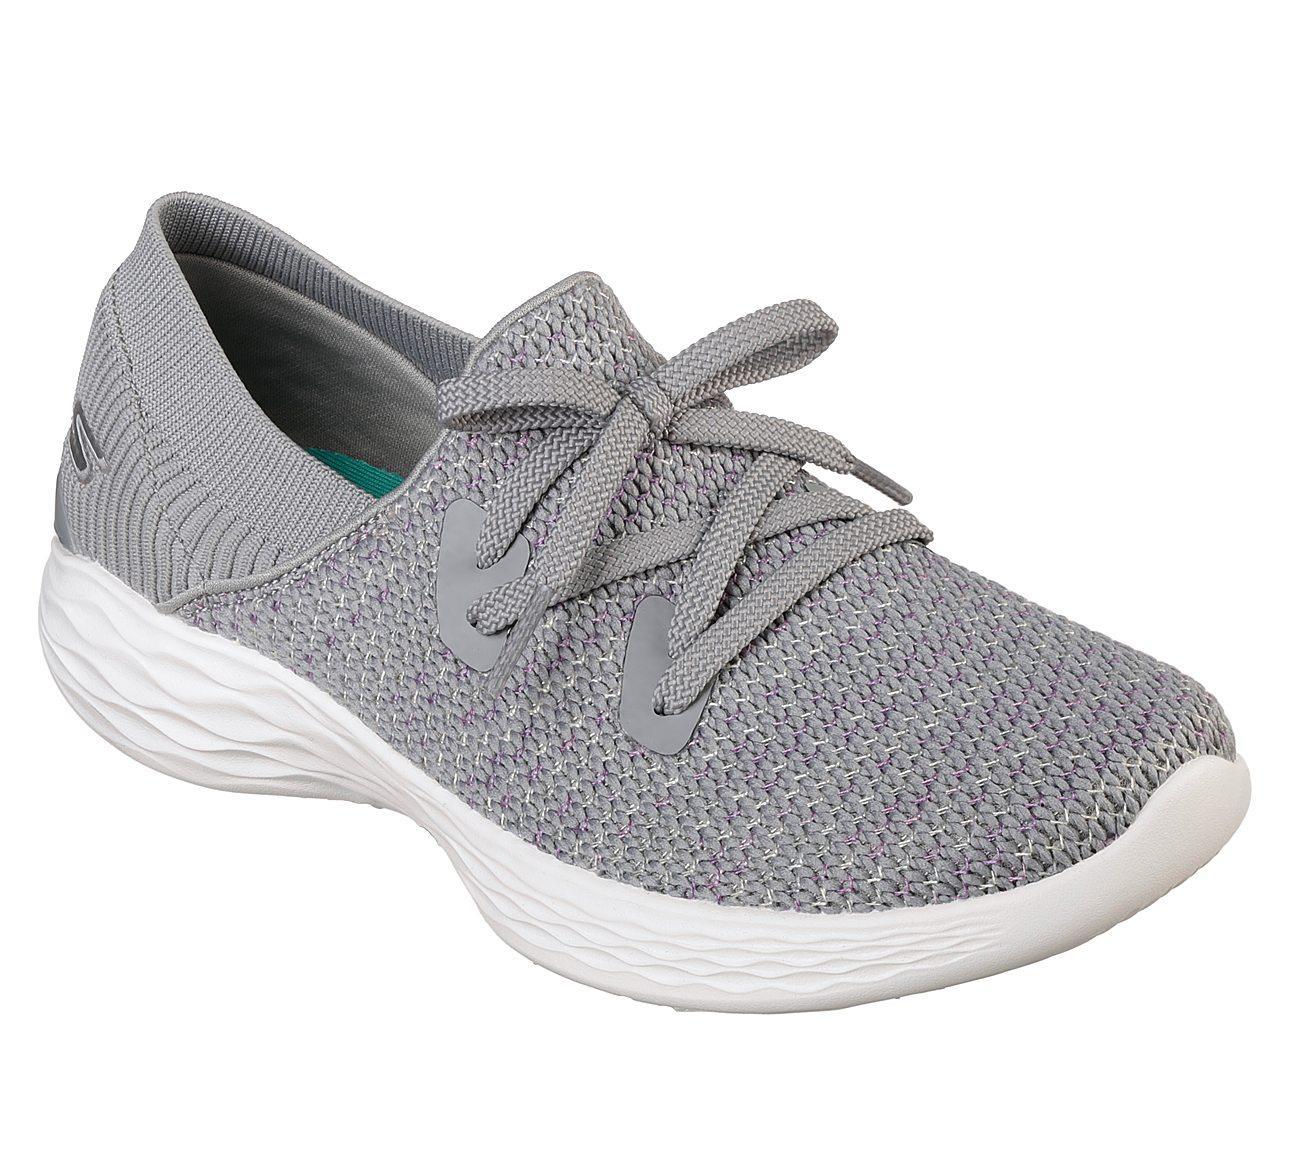 Skechers - YOU - Prominence Sepatu Sneakers Wanita - Abu-Abu de9d74e723